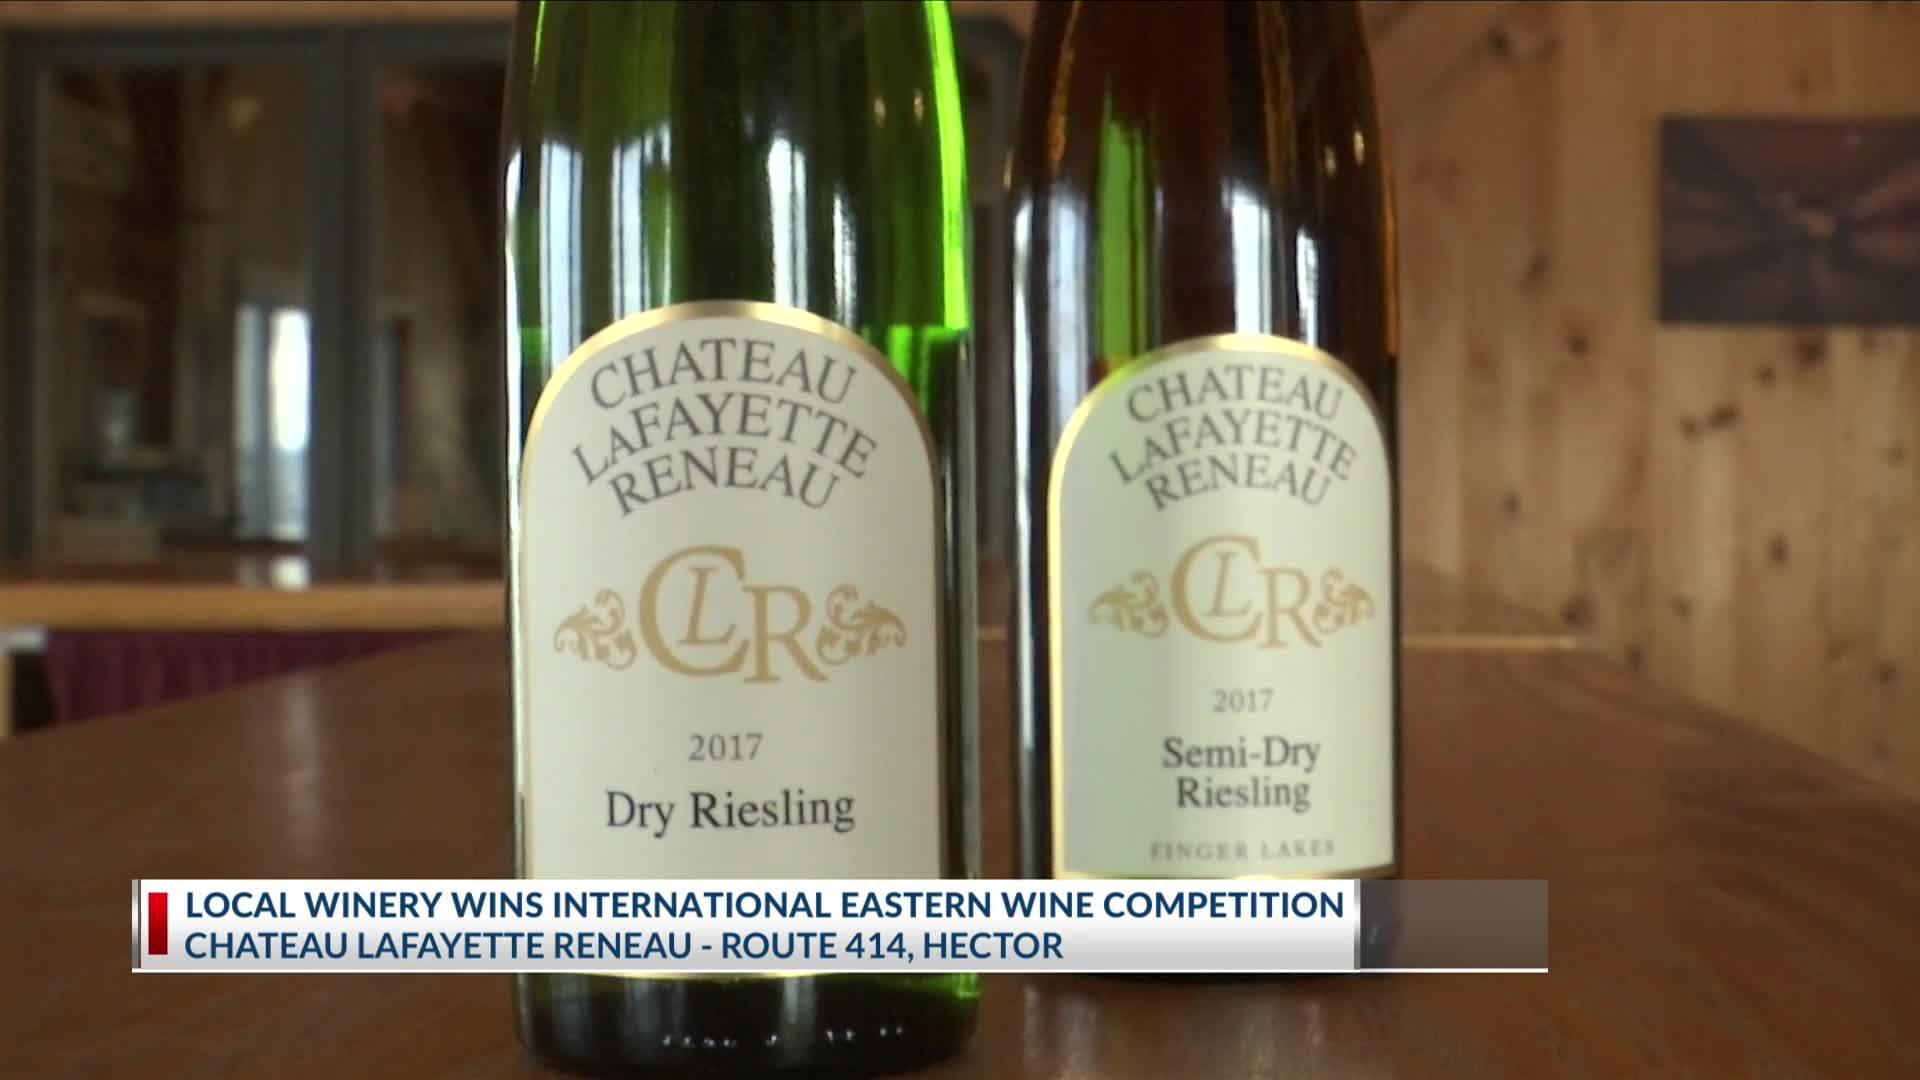 Chateau_LaFayette_Reneau_wins_internatio_6_20190301231840